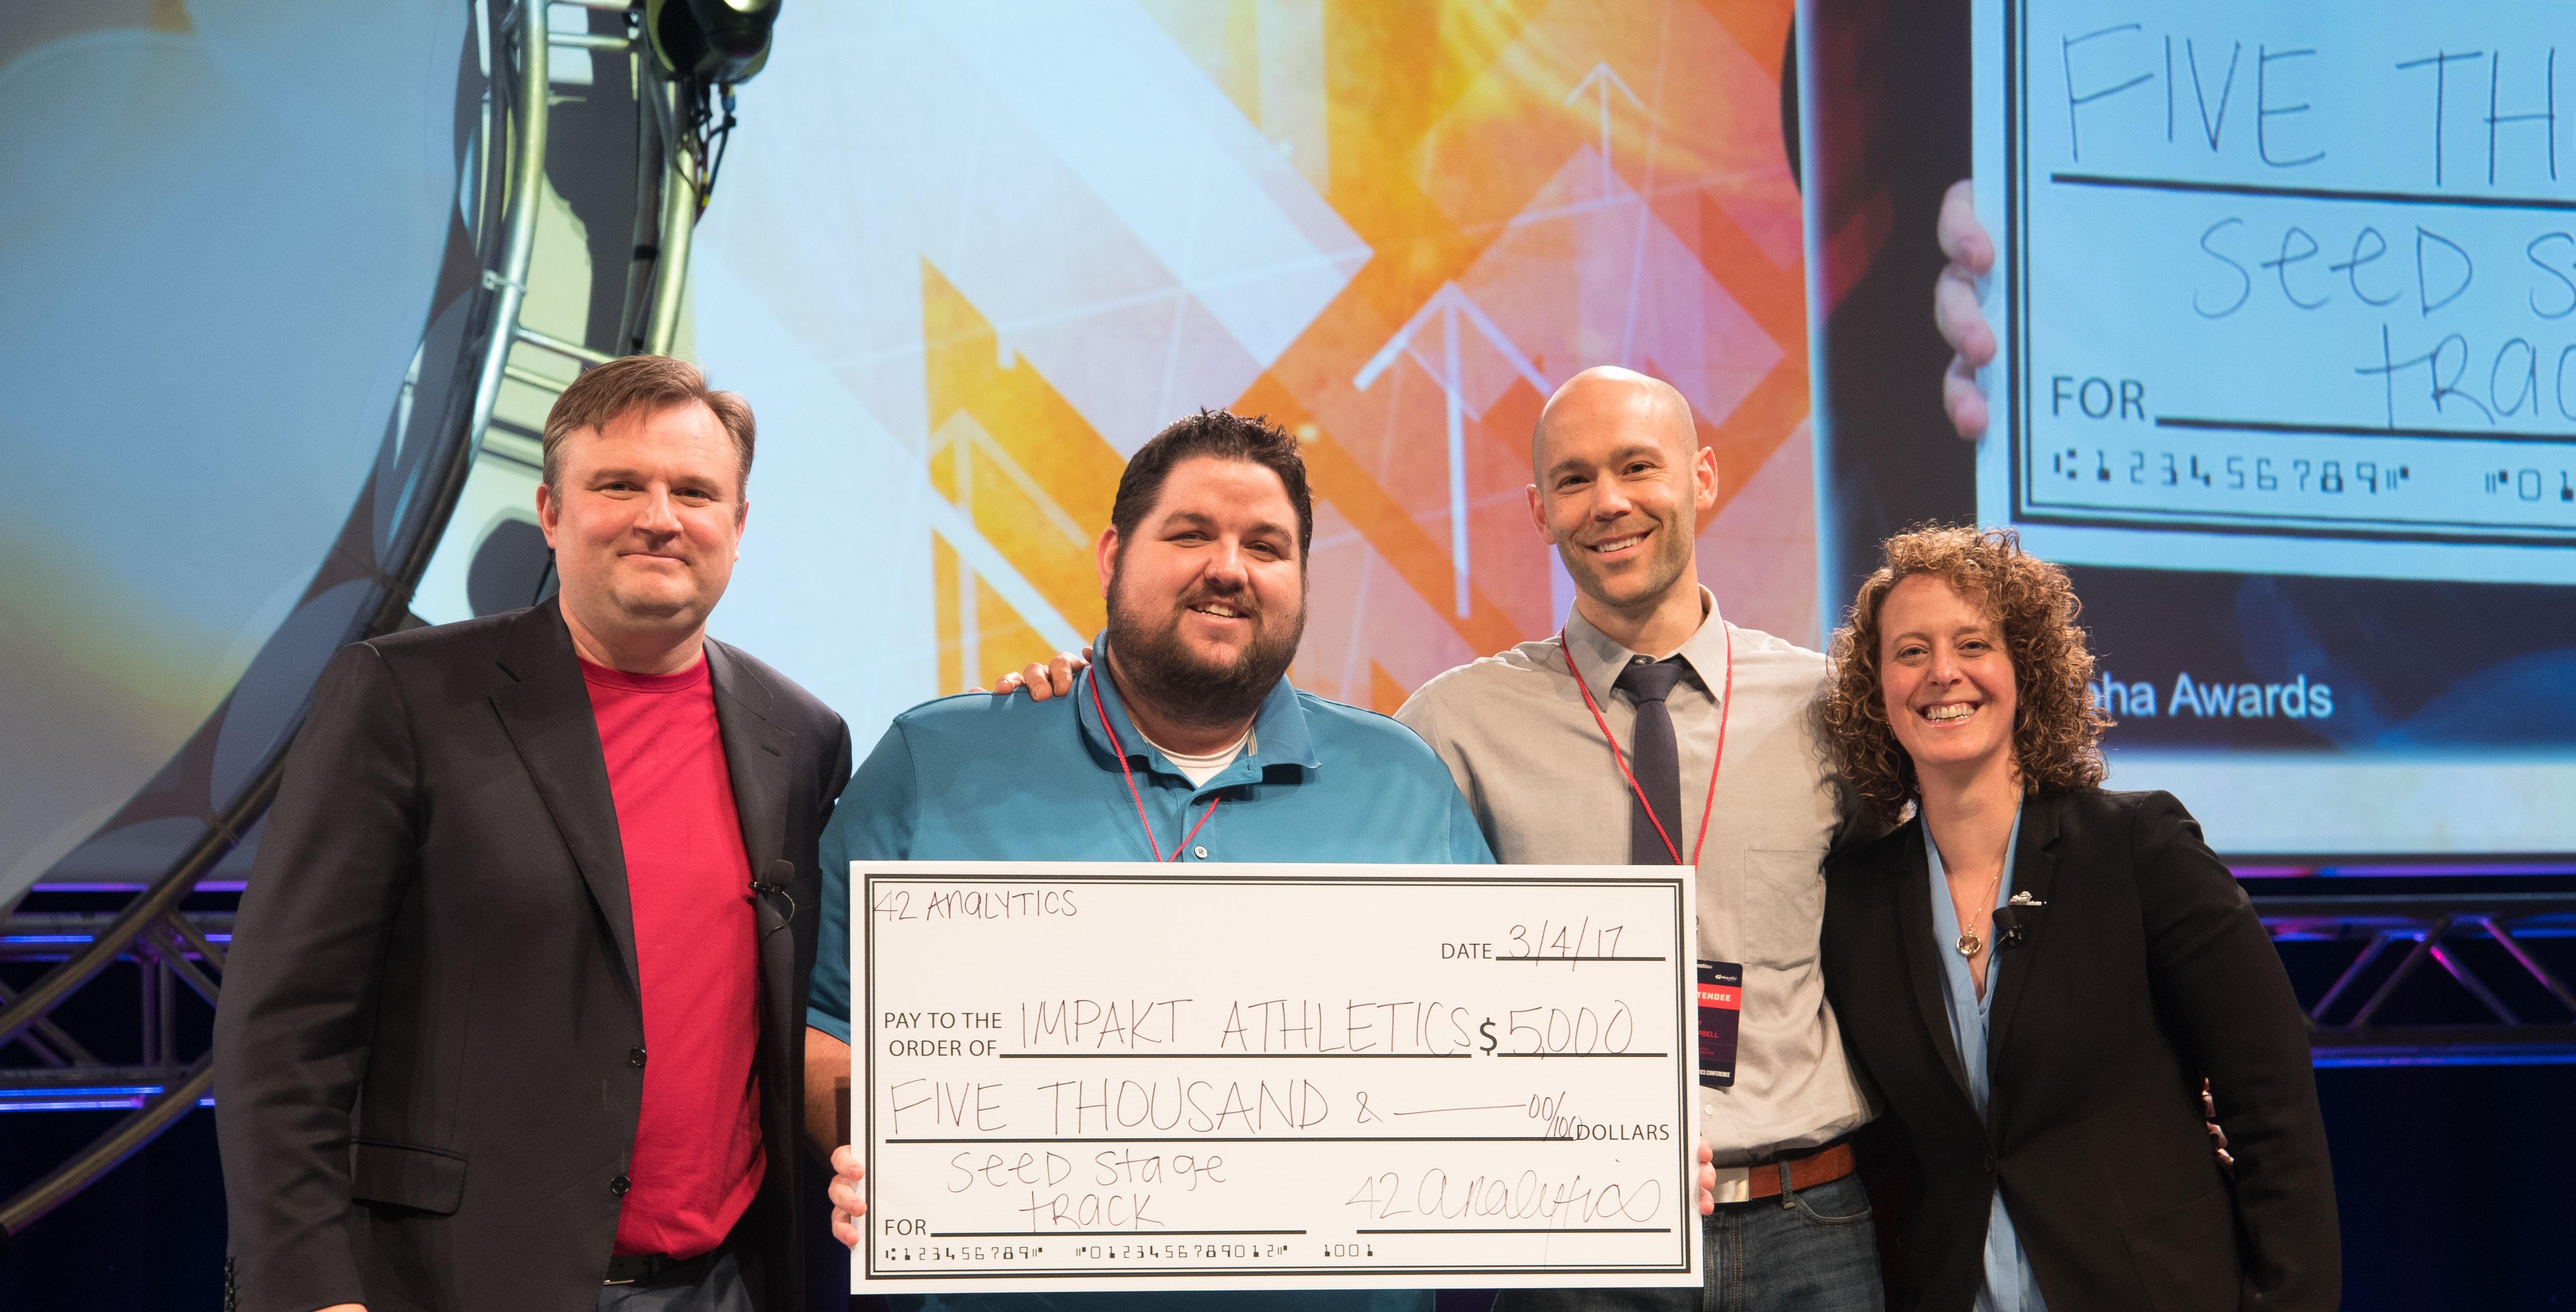 Impakt Athletics Wins at MIT Sloan Sports Analytics